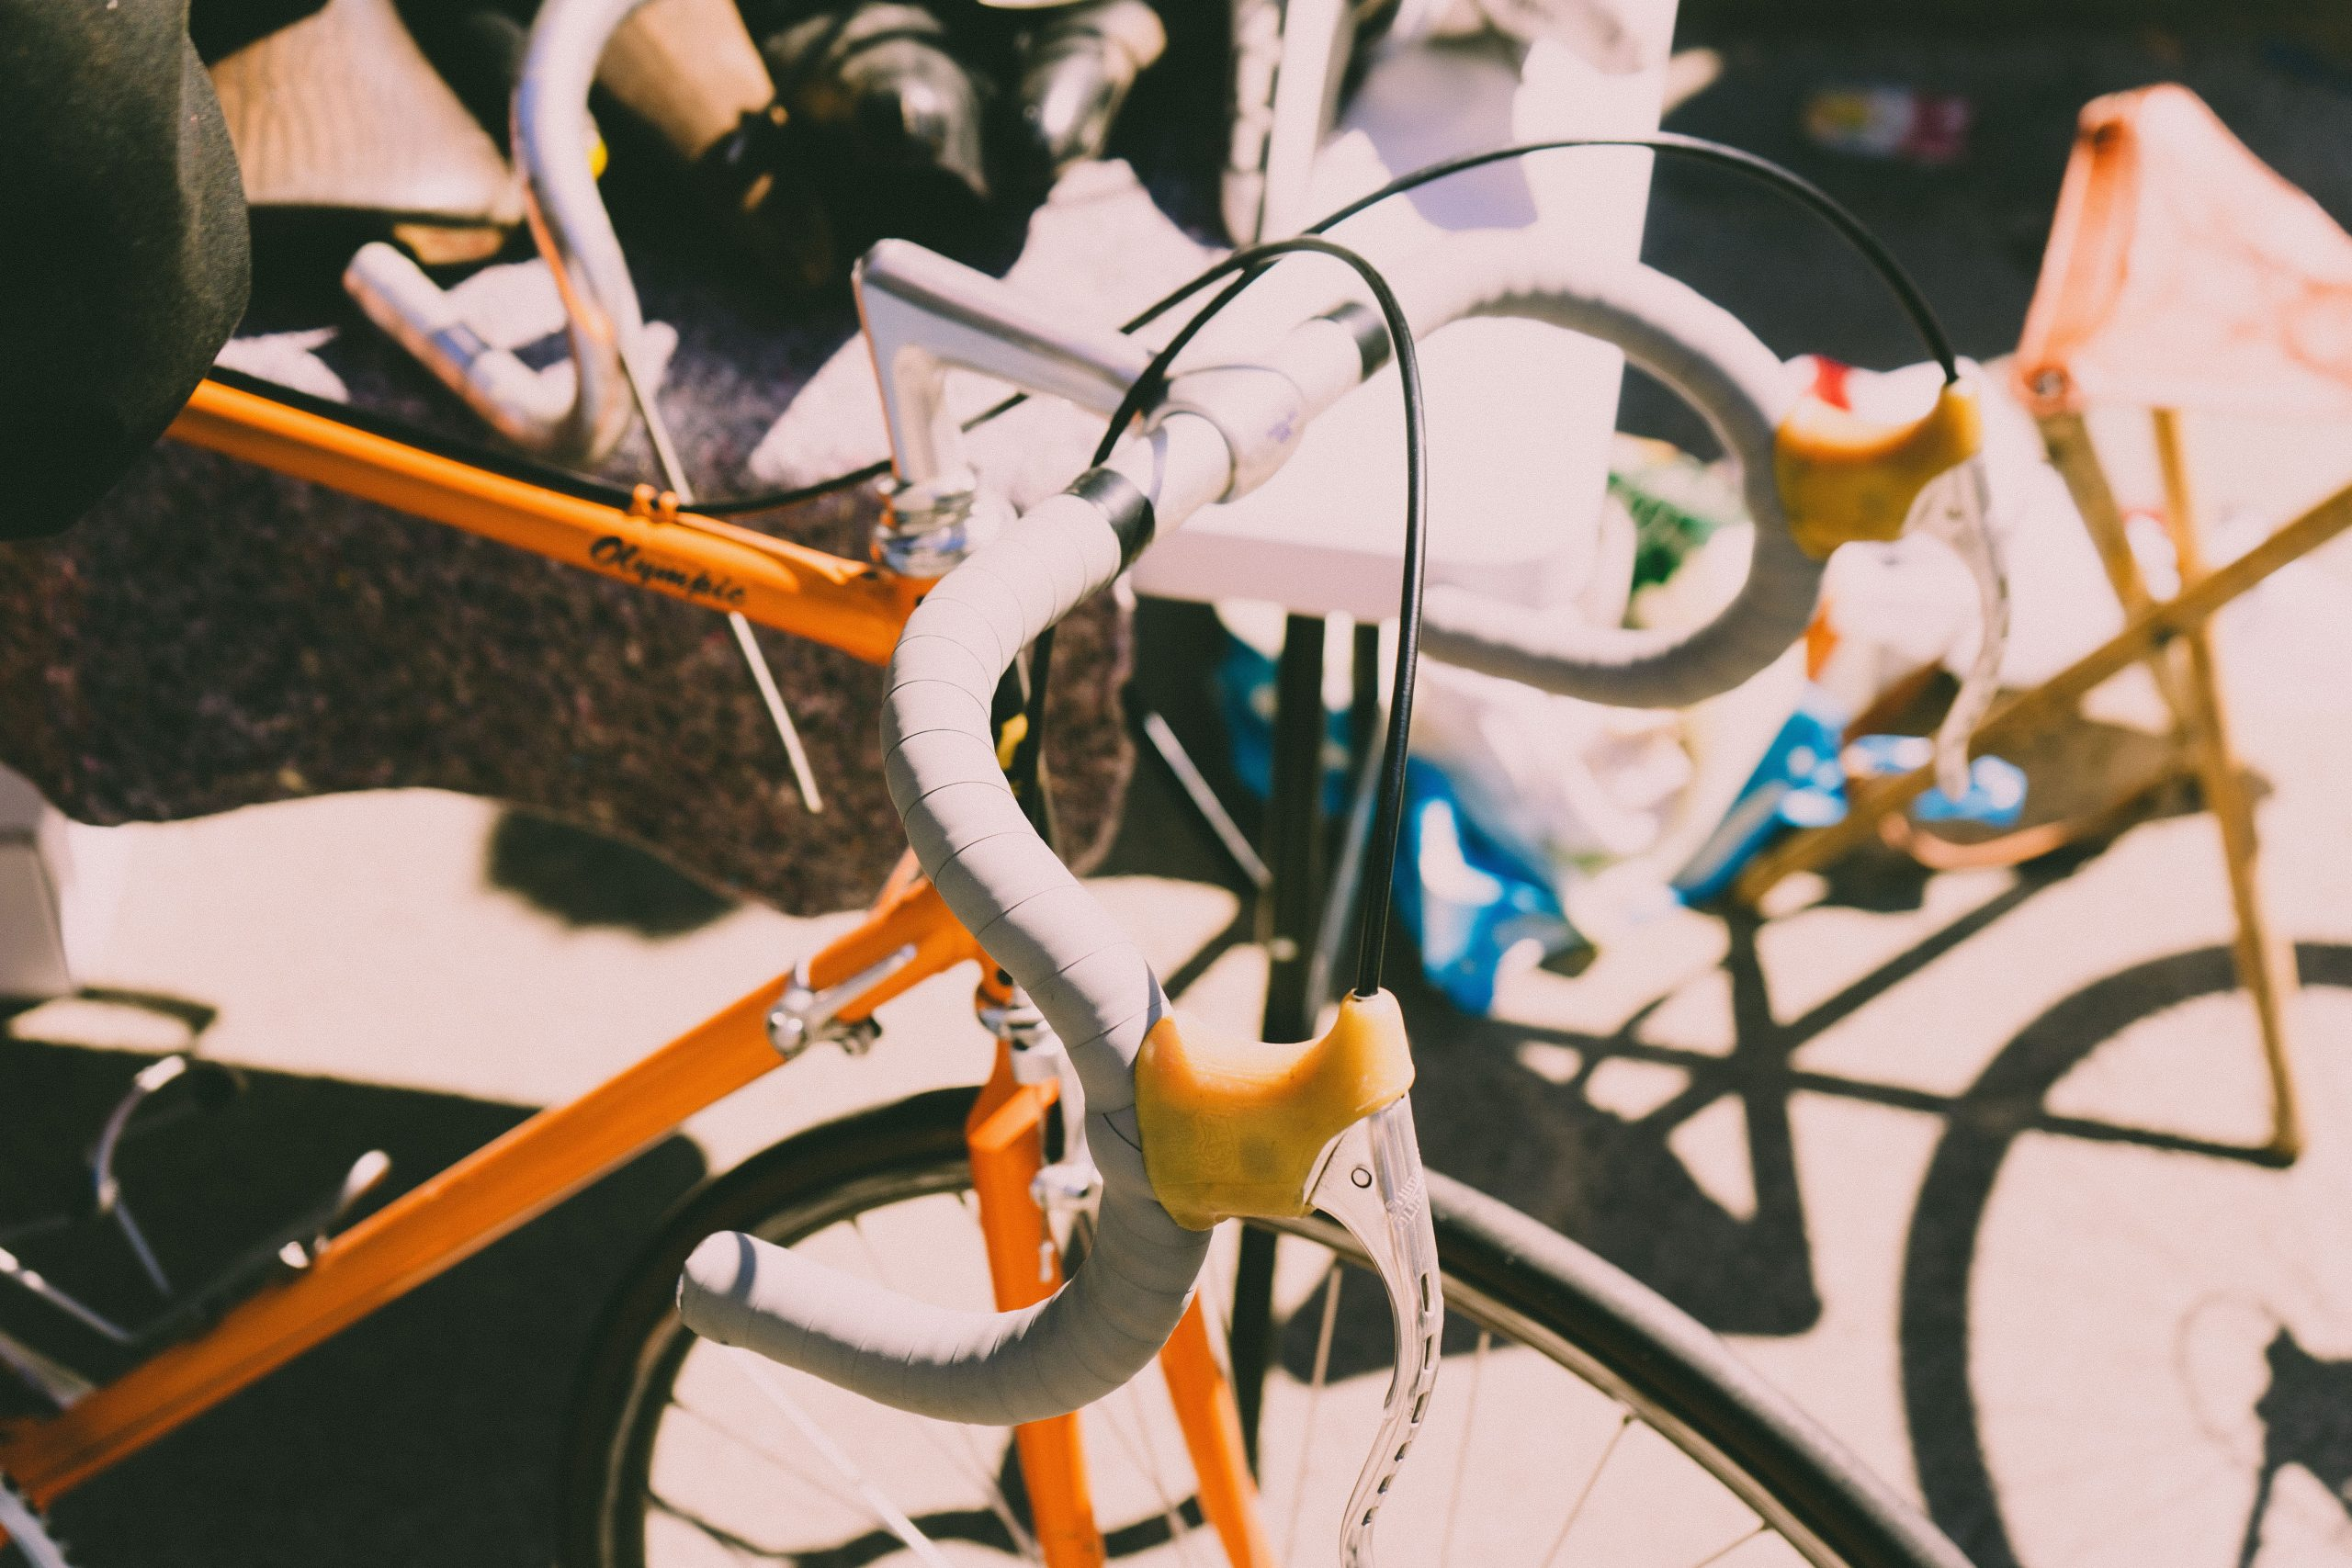 orange and white commuter bike